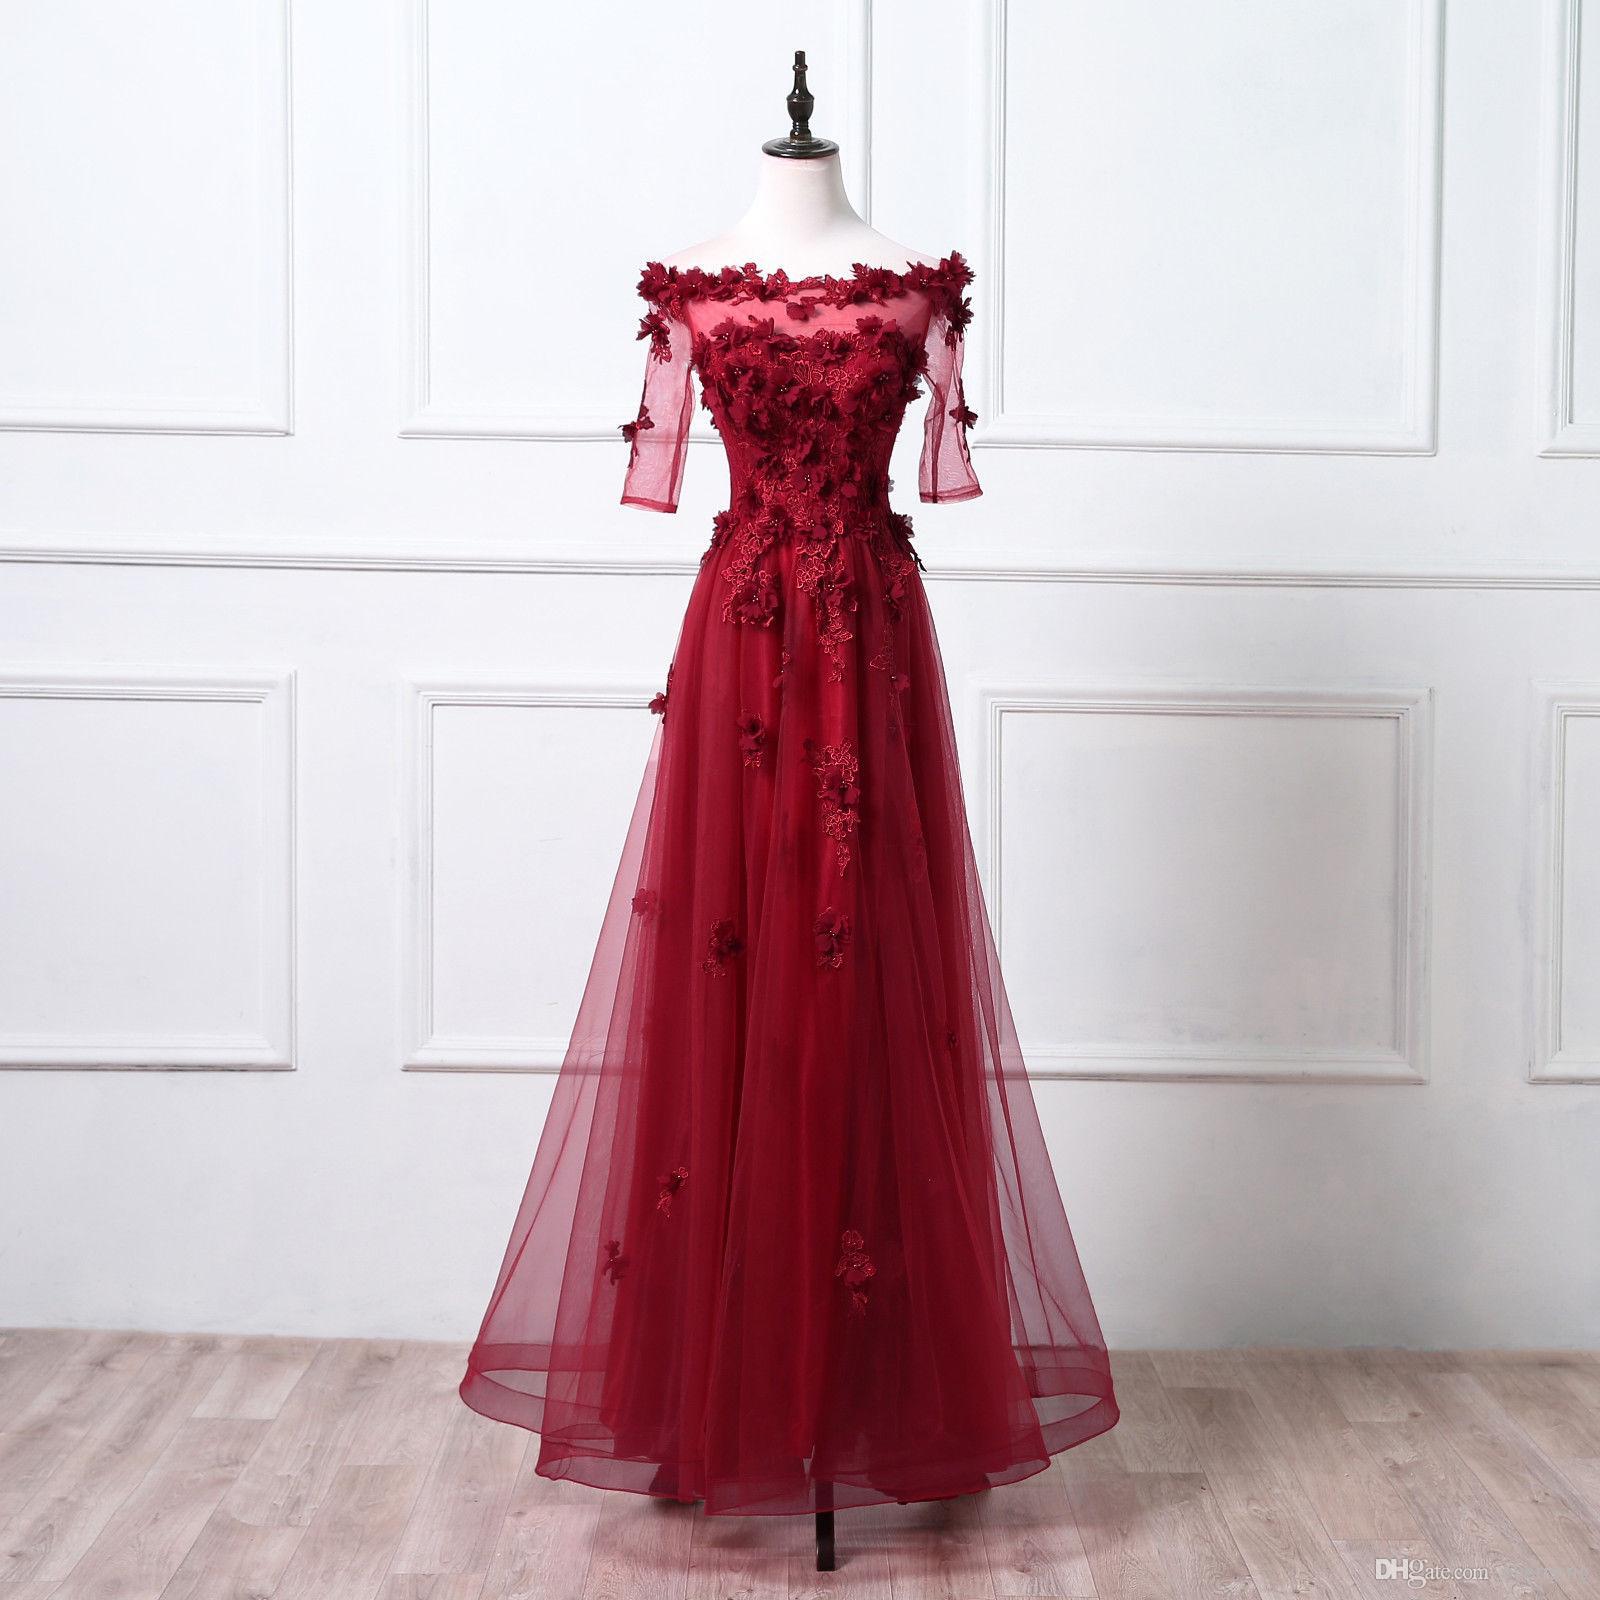 fce38cc8c3 modabelle Elegant Evening Dress Robe De Soiree The Bride Burgundy Lace  Flower Beading Long Party Prom Dresses Custom